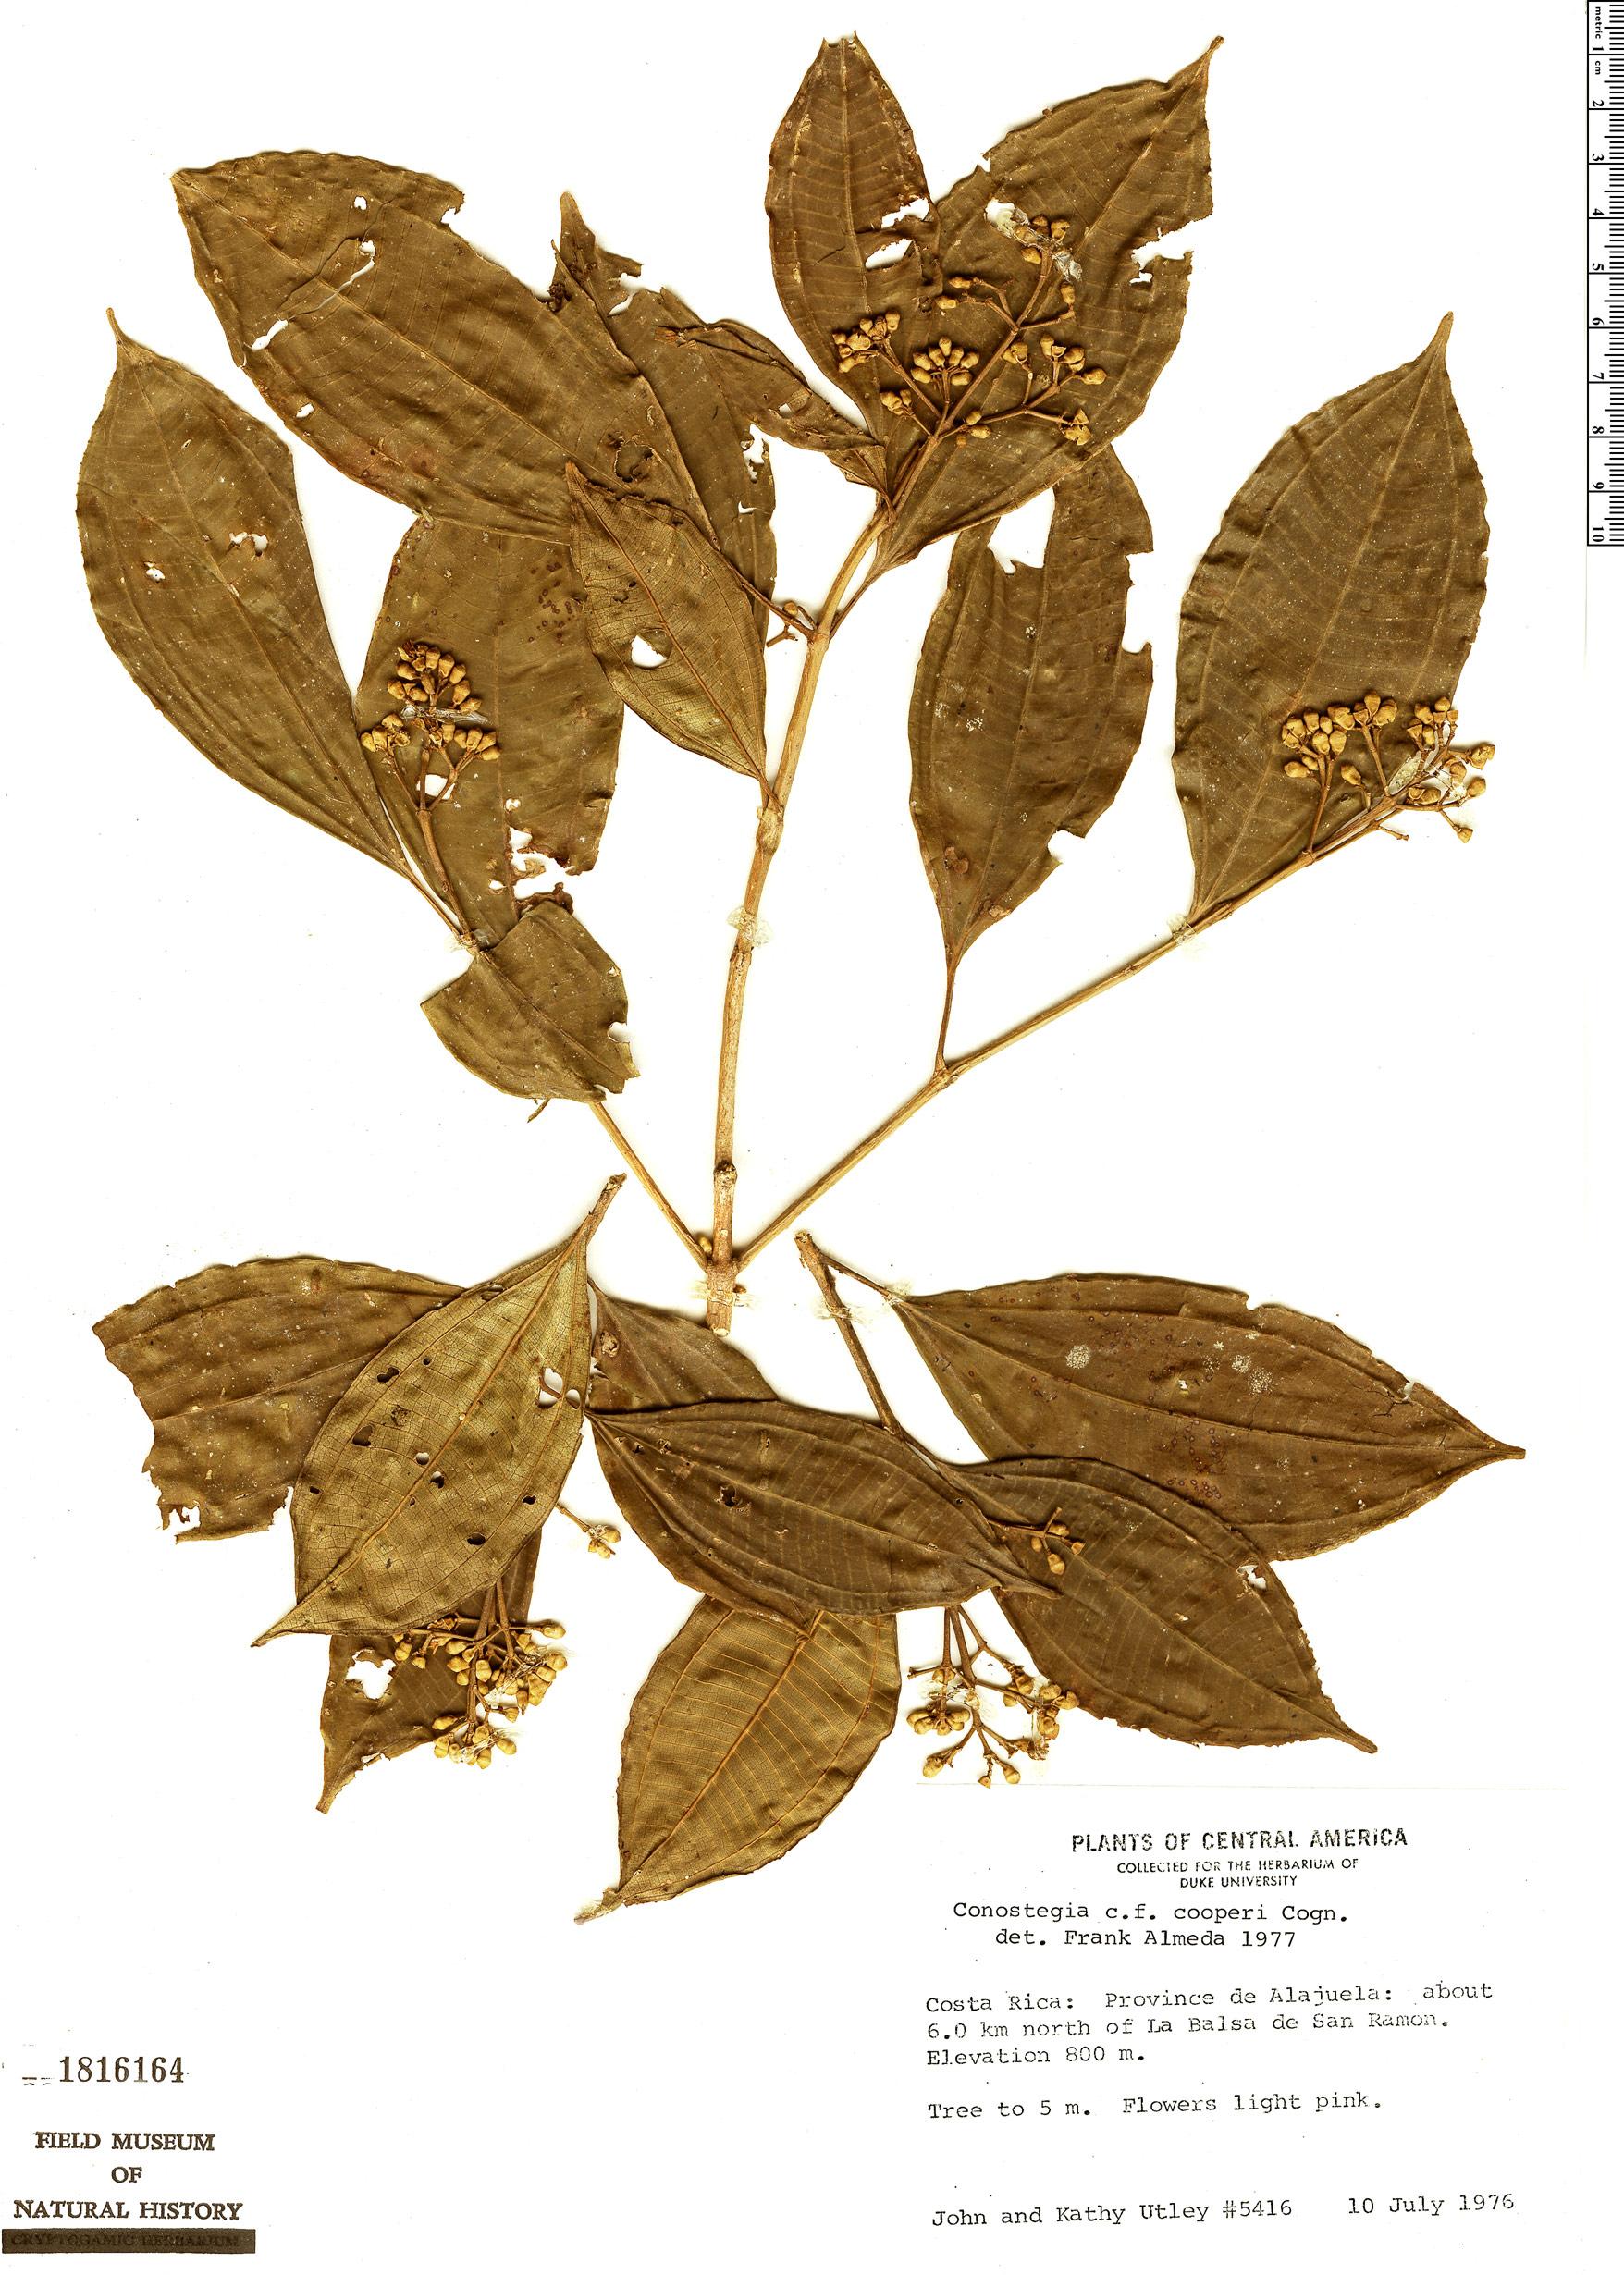 Specimen: Conostegia montana